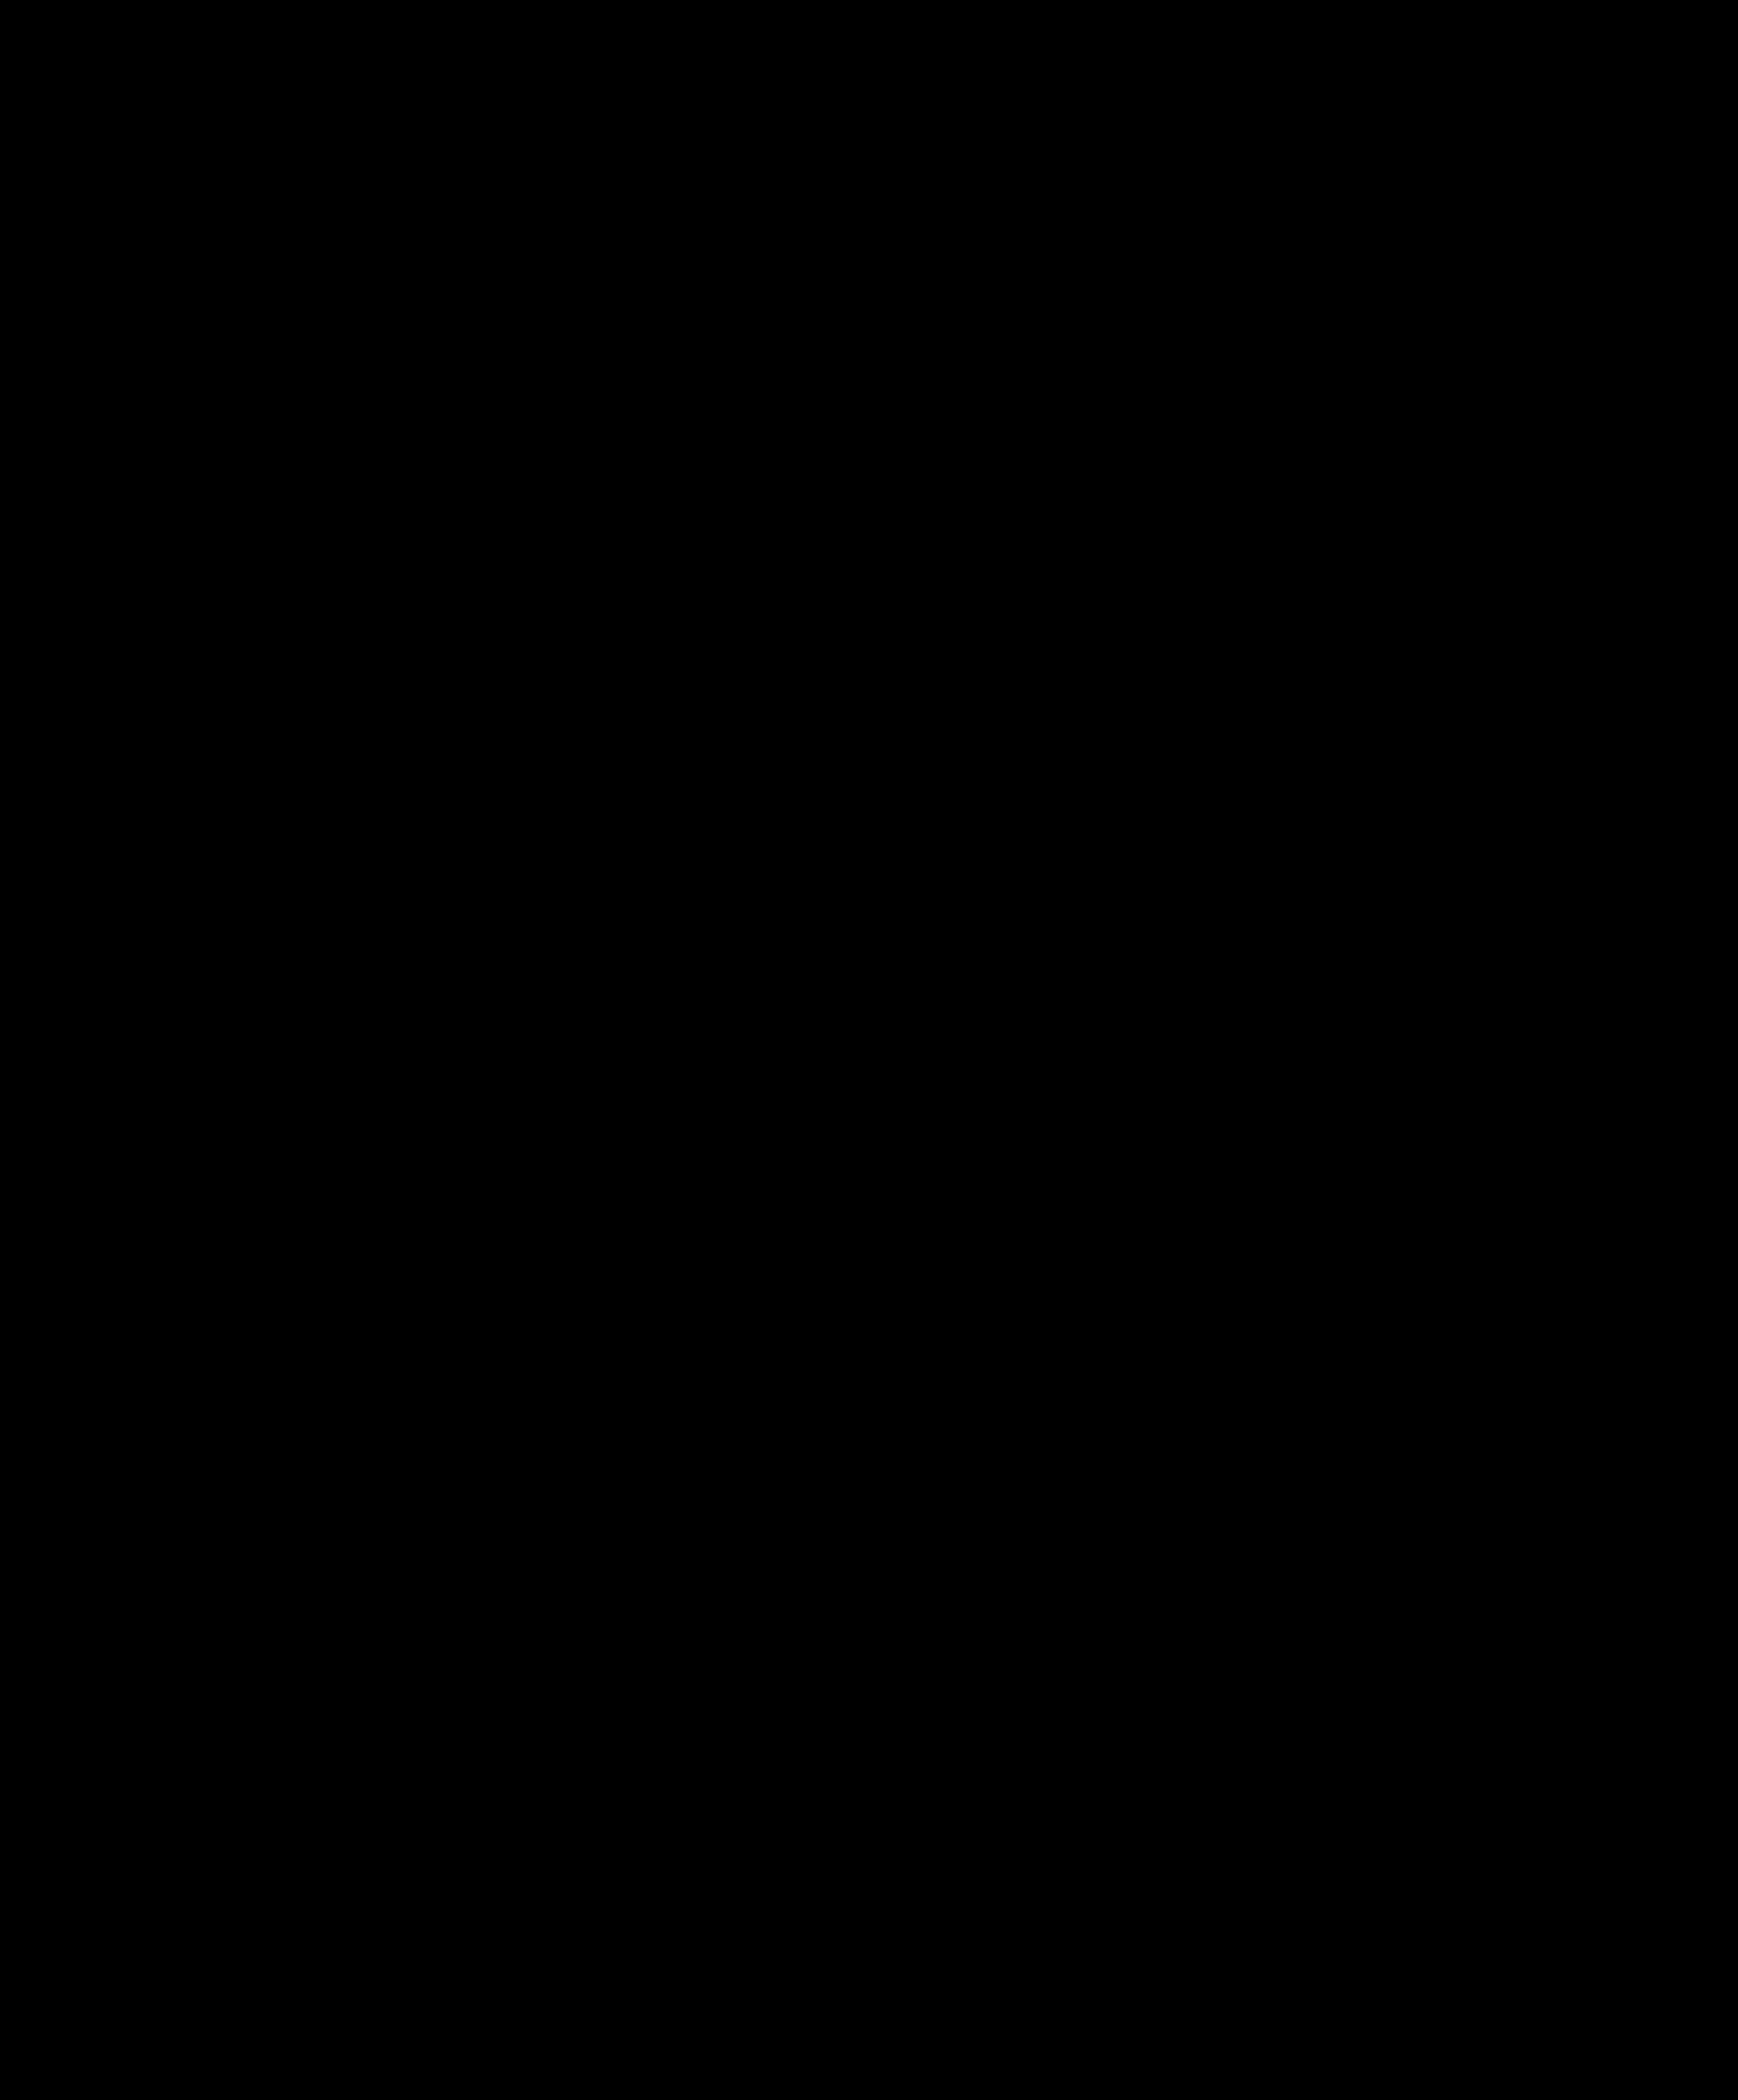 Png circle frame. Clipart flower big image